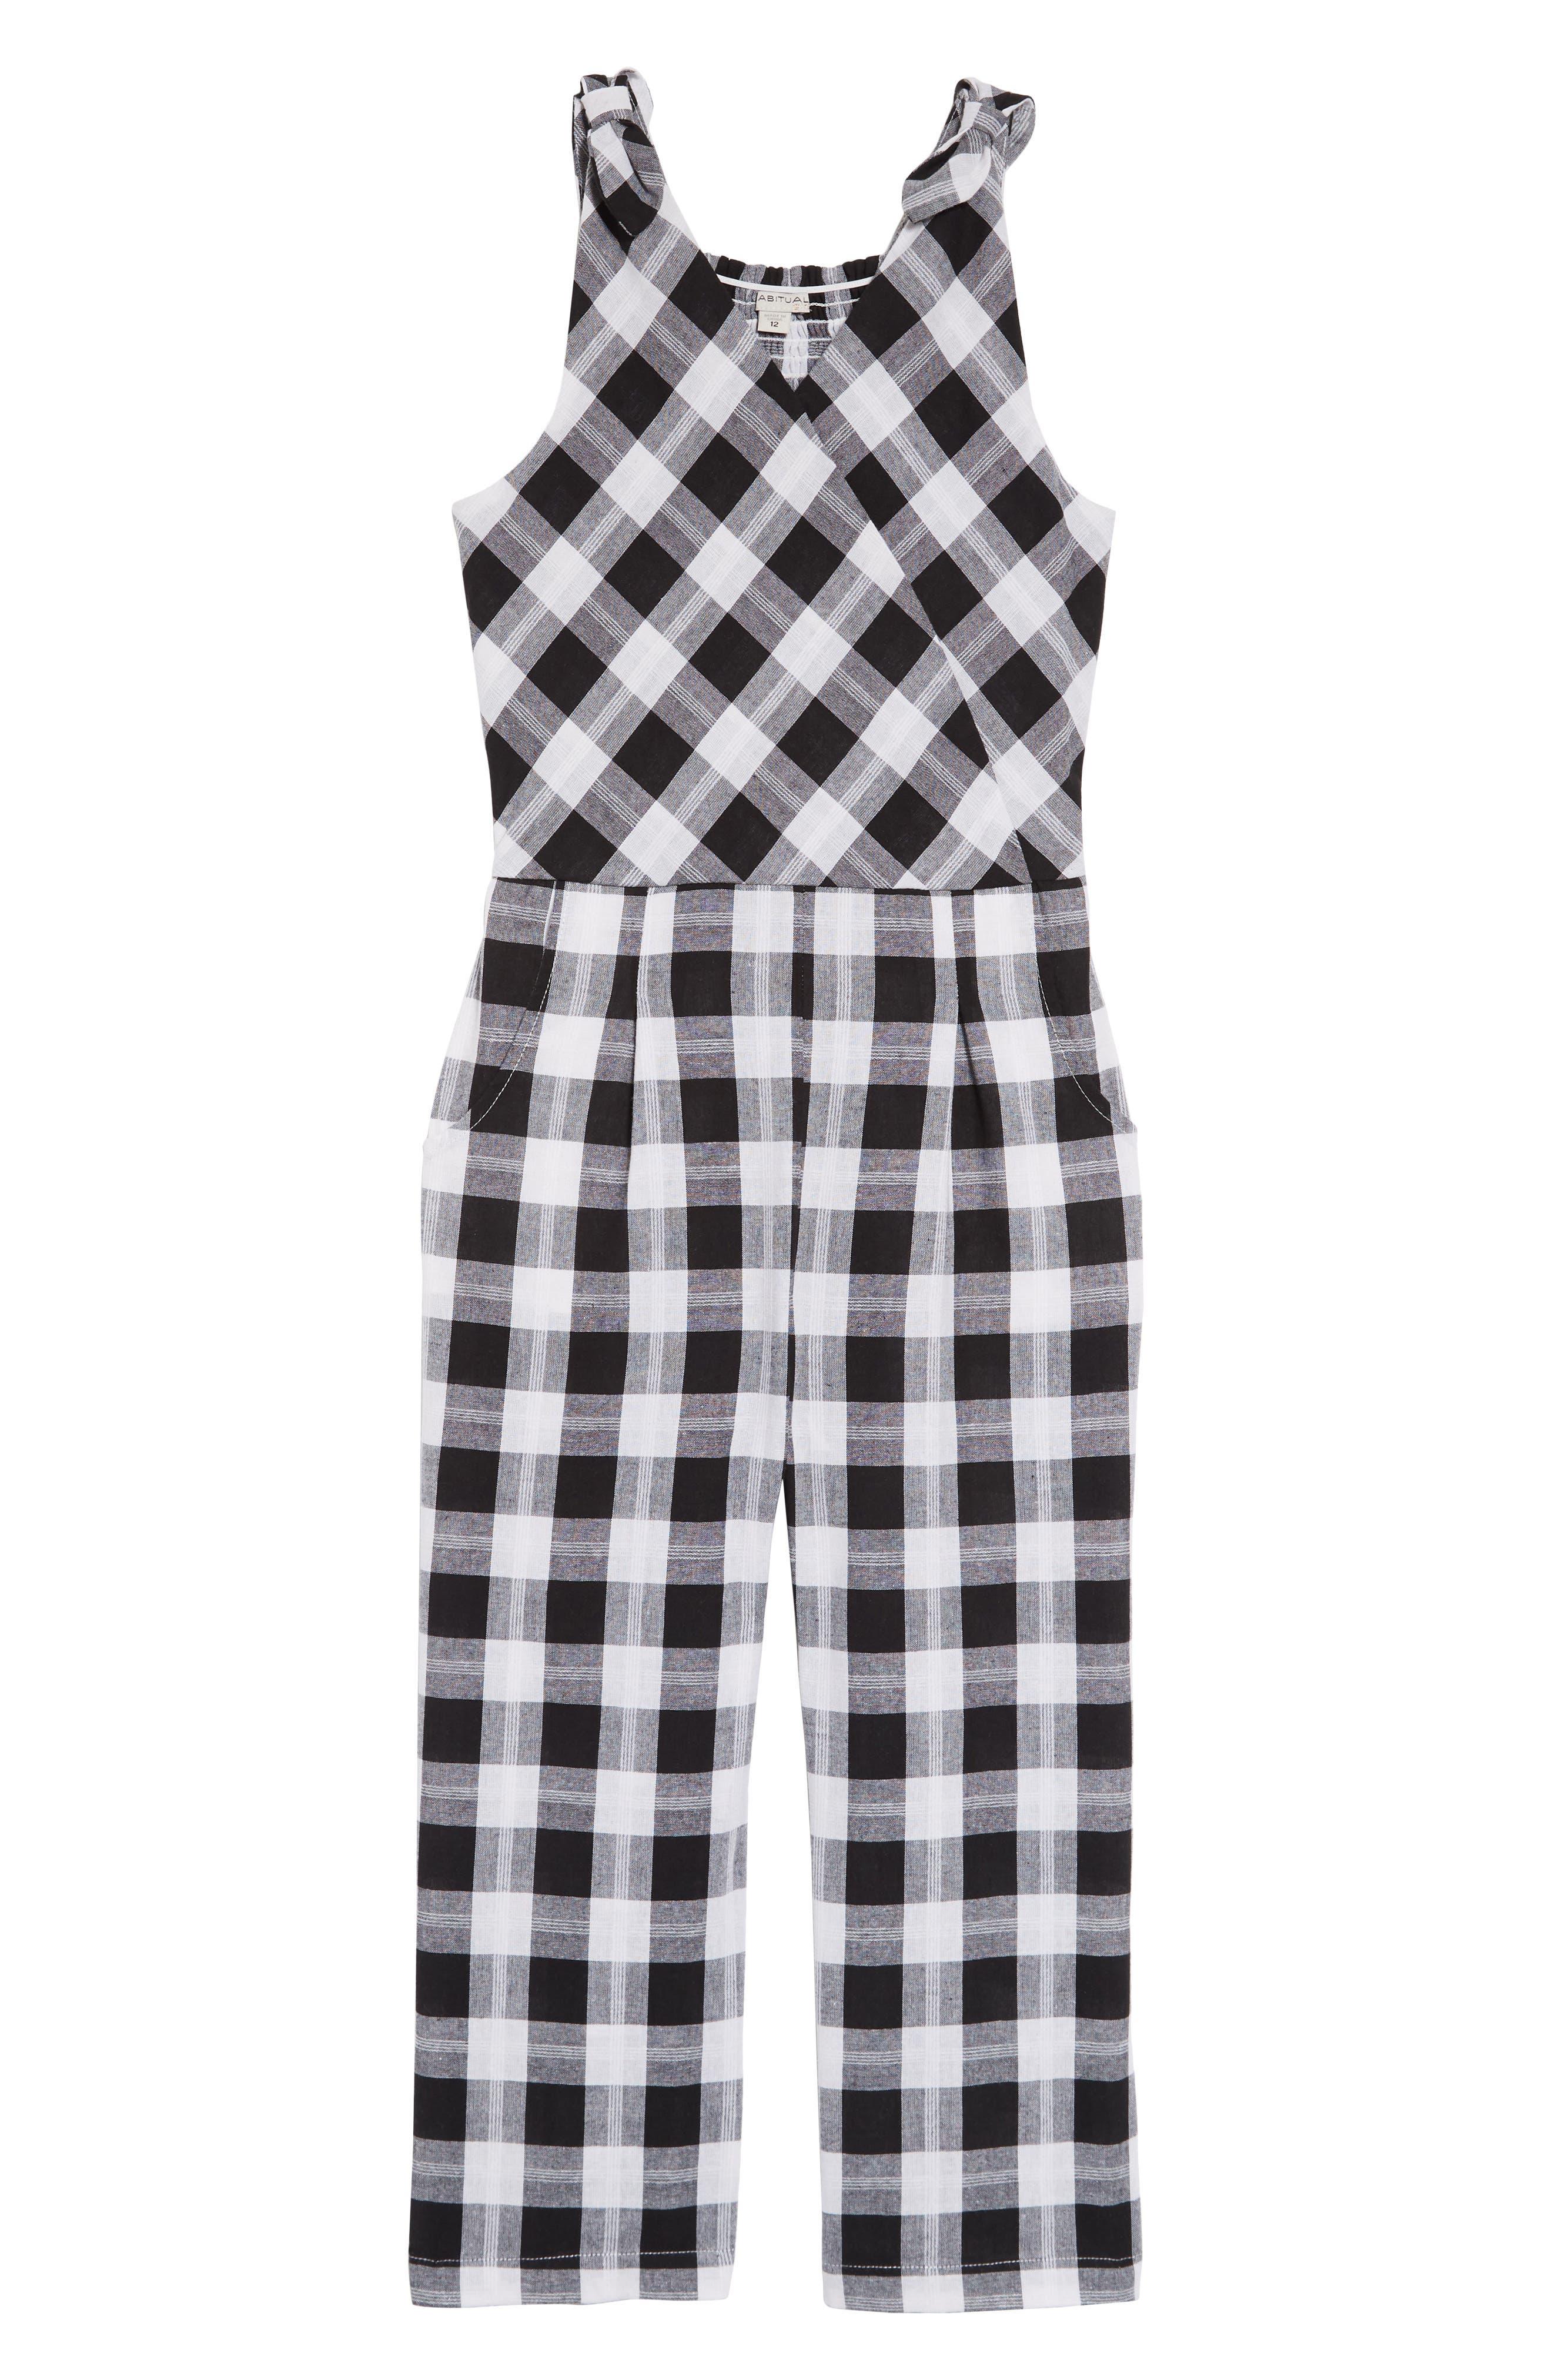 Girls Habitual Kids Kasie Yarn Dyed Plaid Jumpsuit Size 10  Black